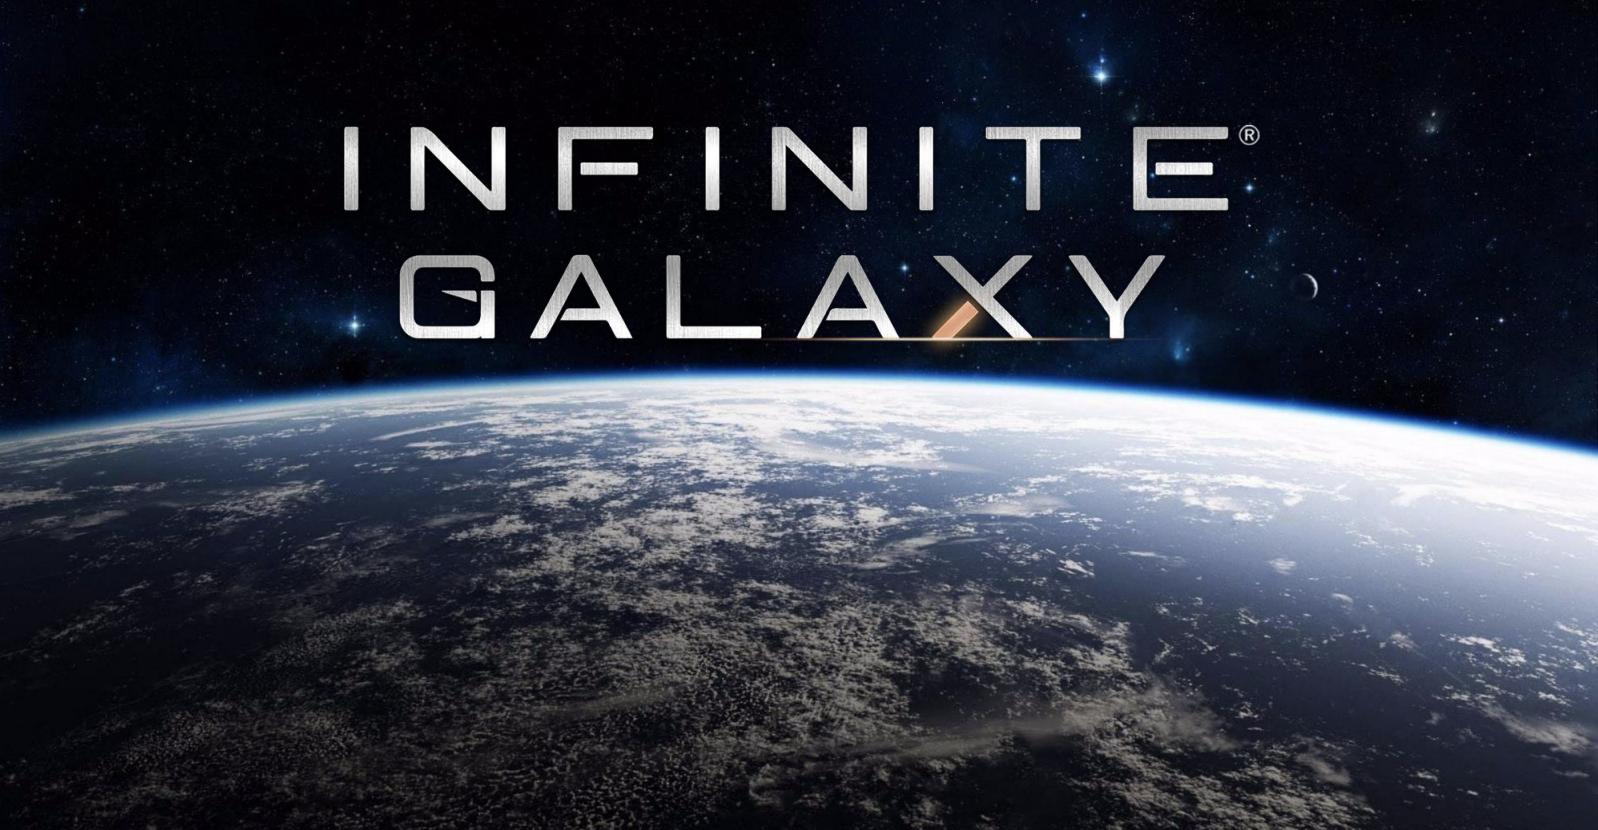 Infinite Galaxy・Tesztlabor